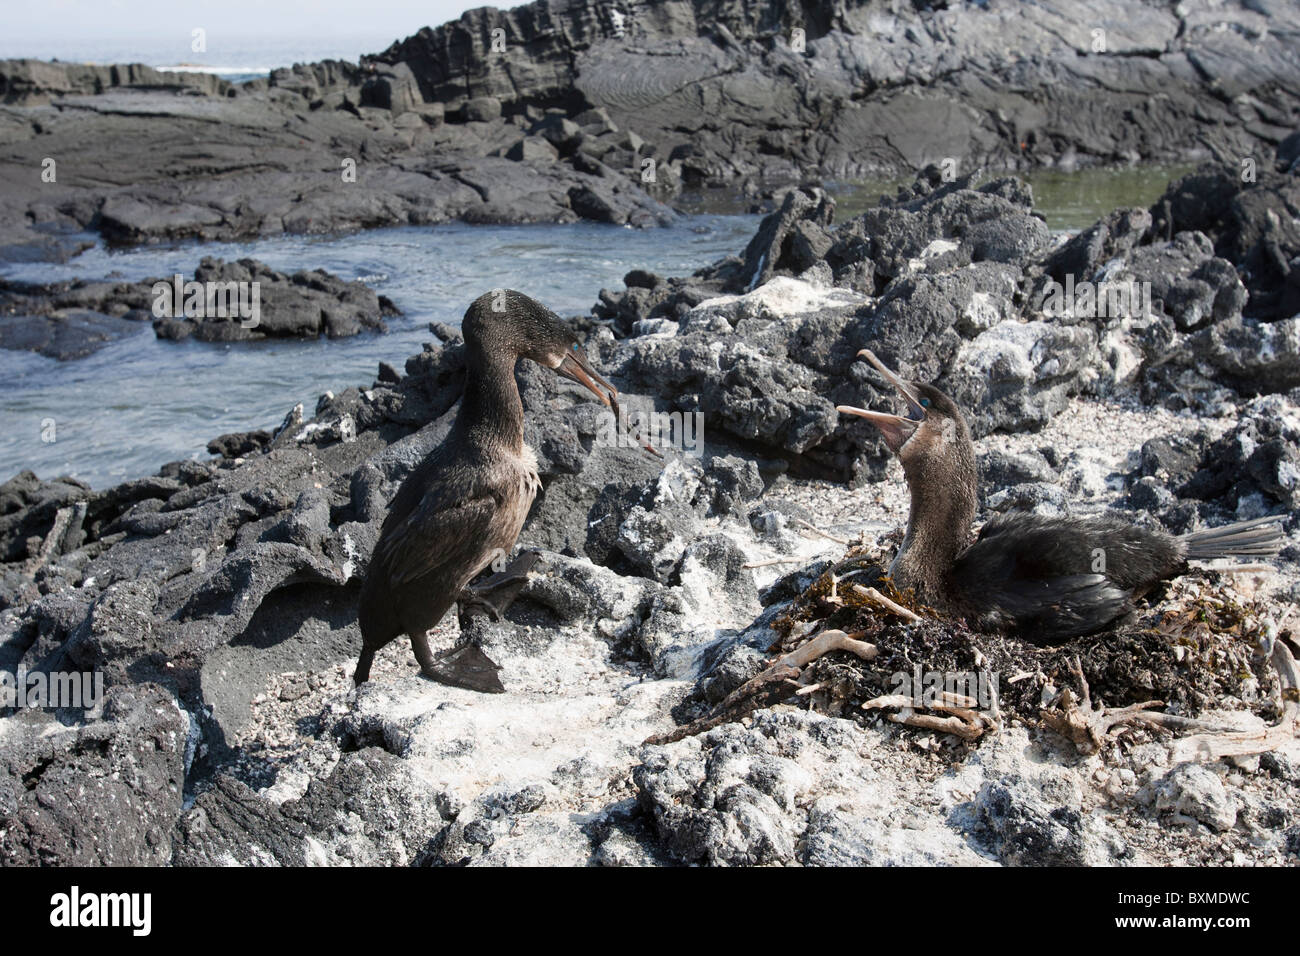 Flightless Cormorant (Phalacrocorax harrisi), mated pair at their nest on Fernandina Island, Galapagos. - Stock Image